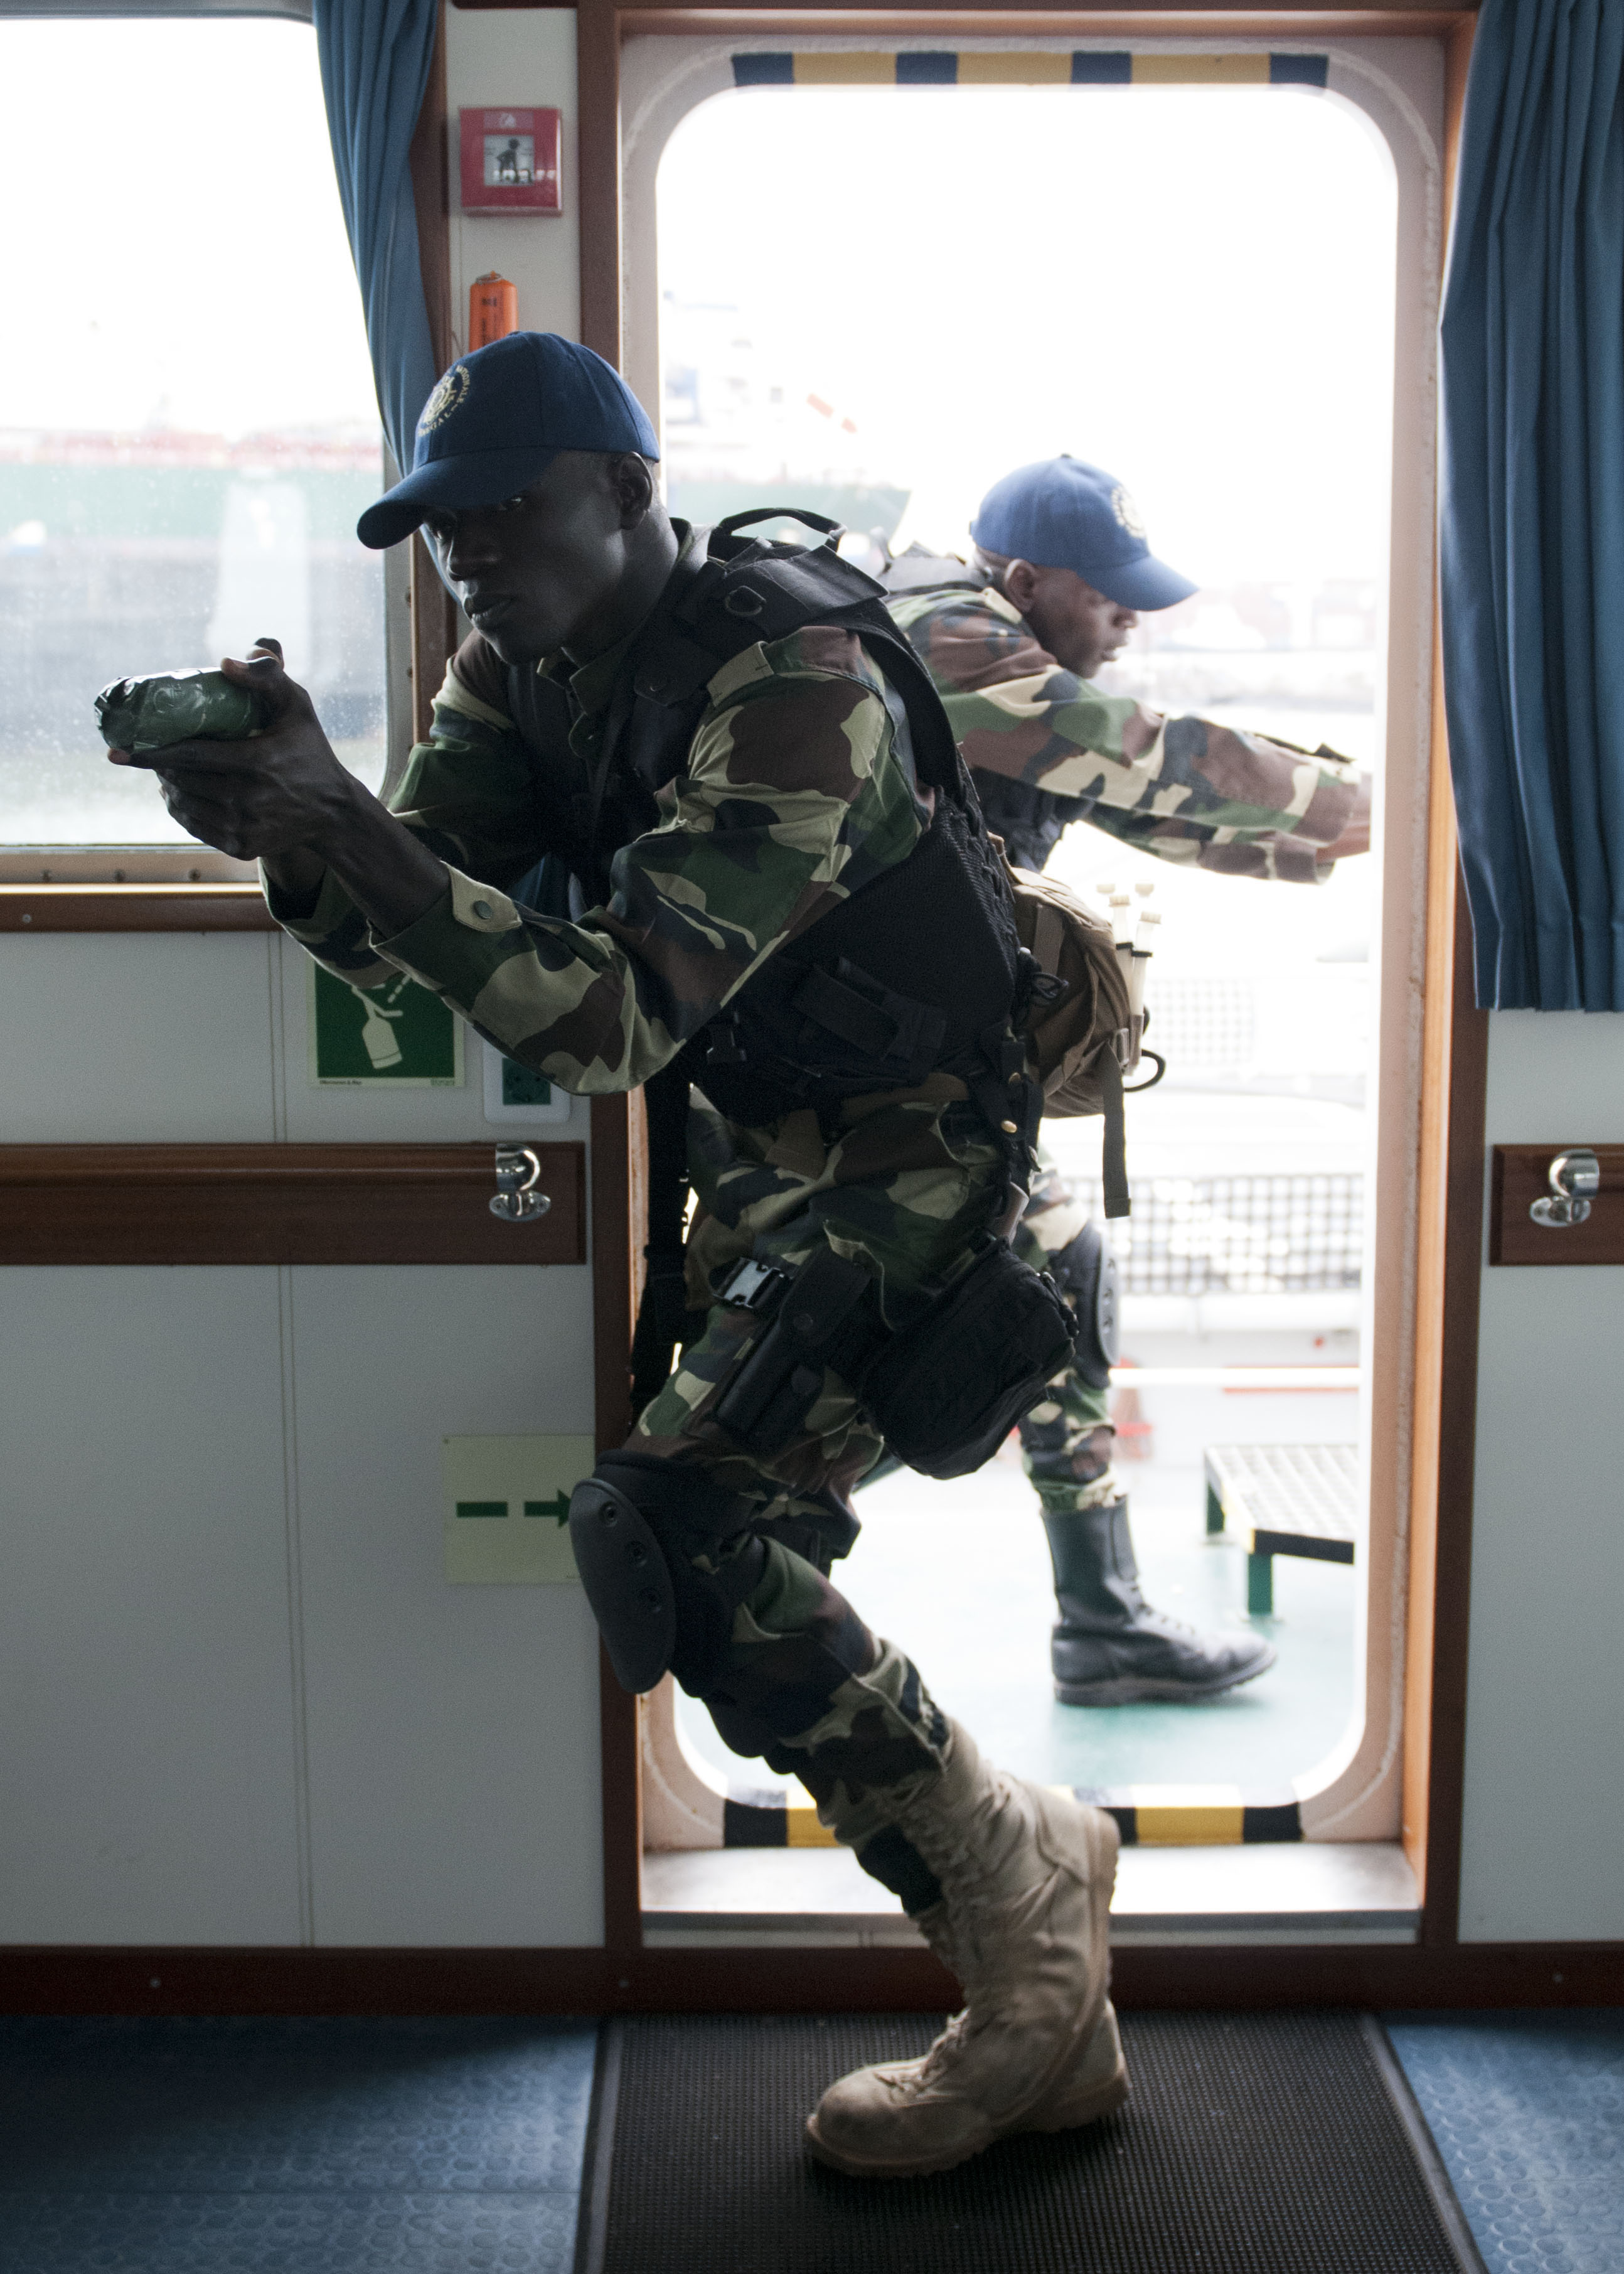 Armée Sénégalaise - Page 5 13012383615_73df3b4d2a_o